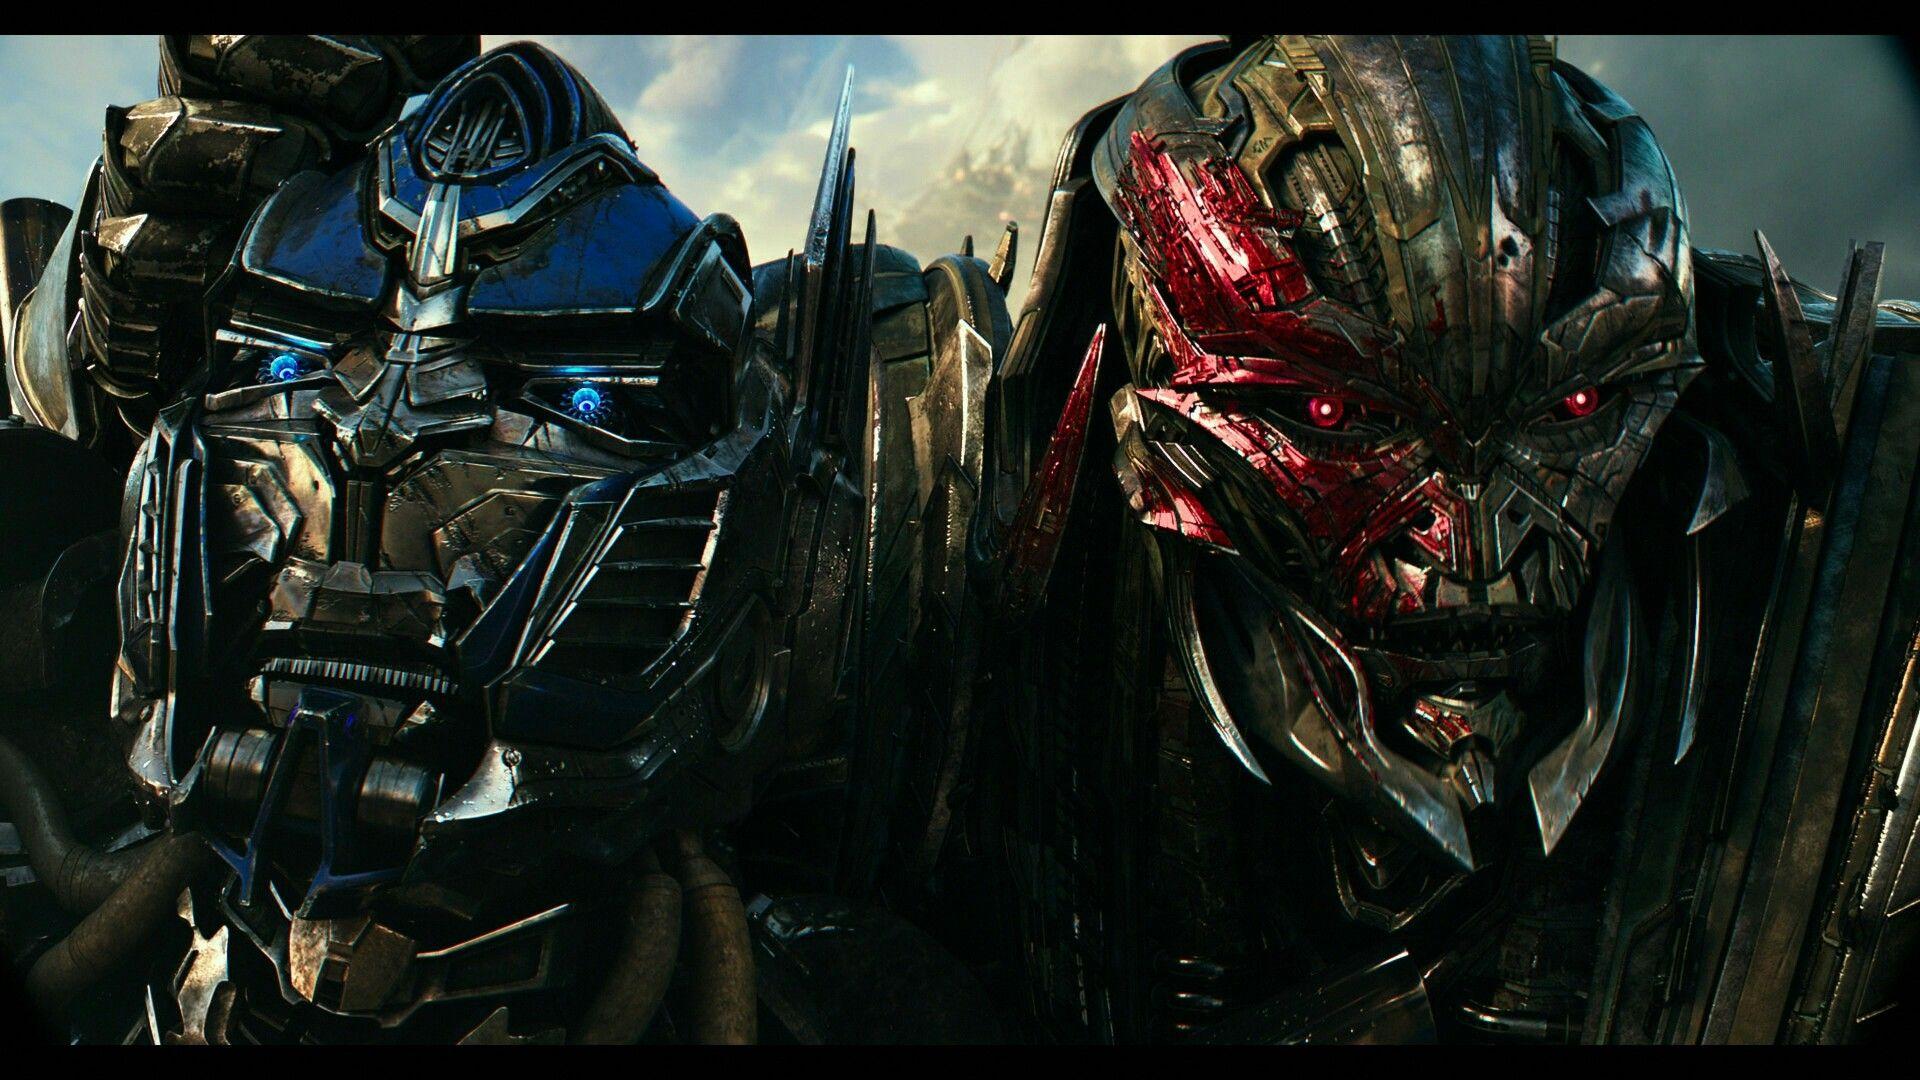 Optimus Prime and Megatron high quality 4k screenshot the